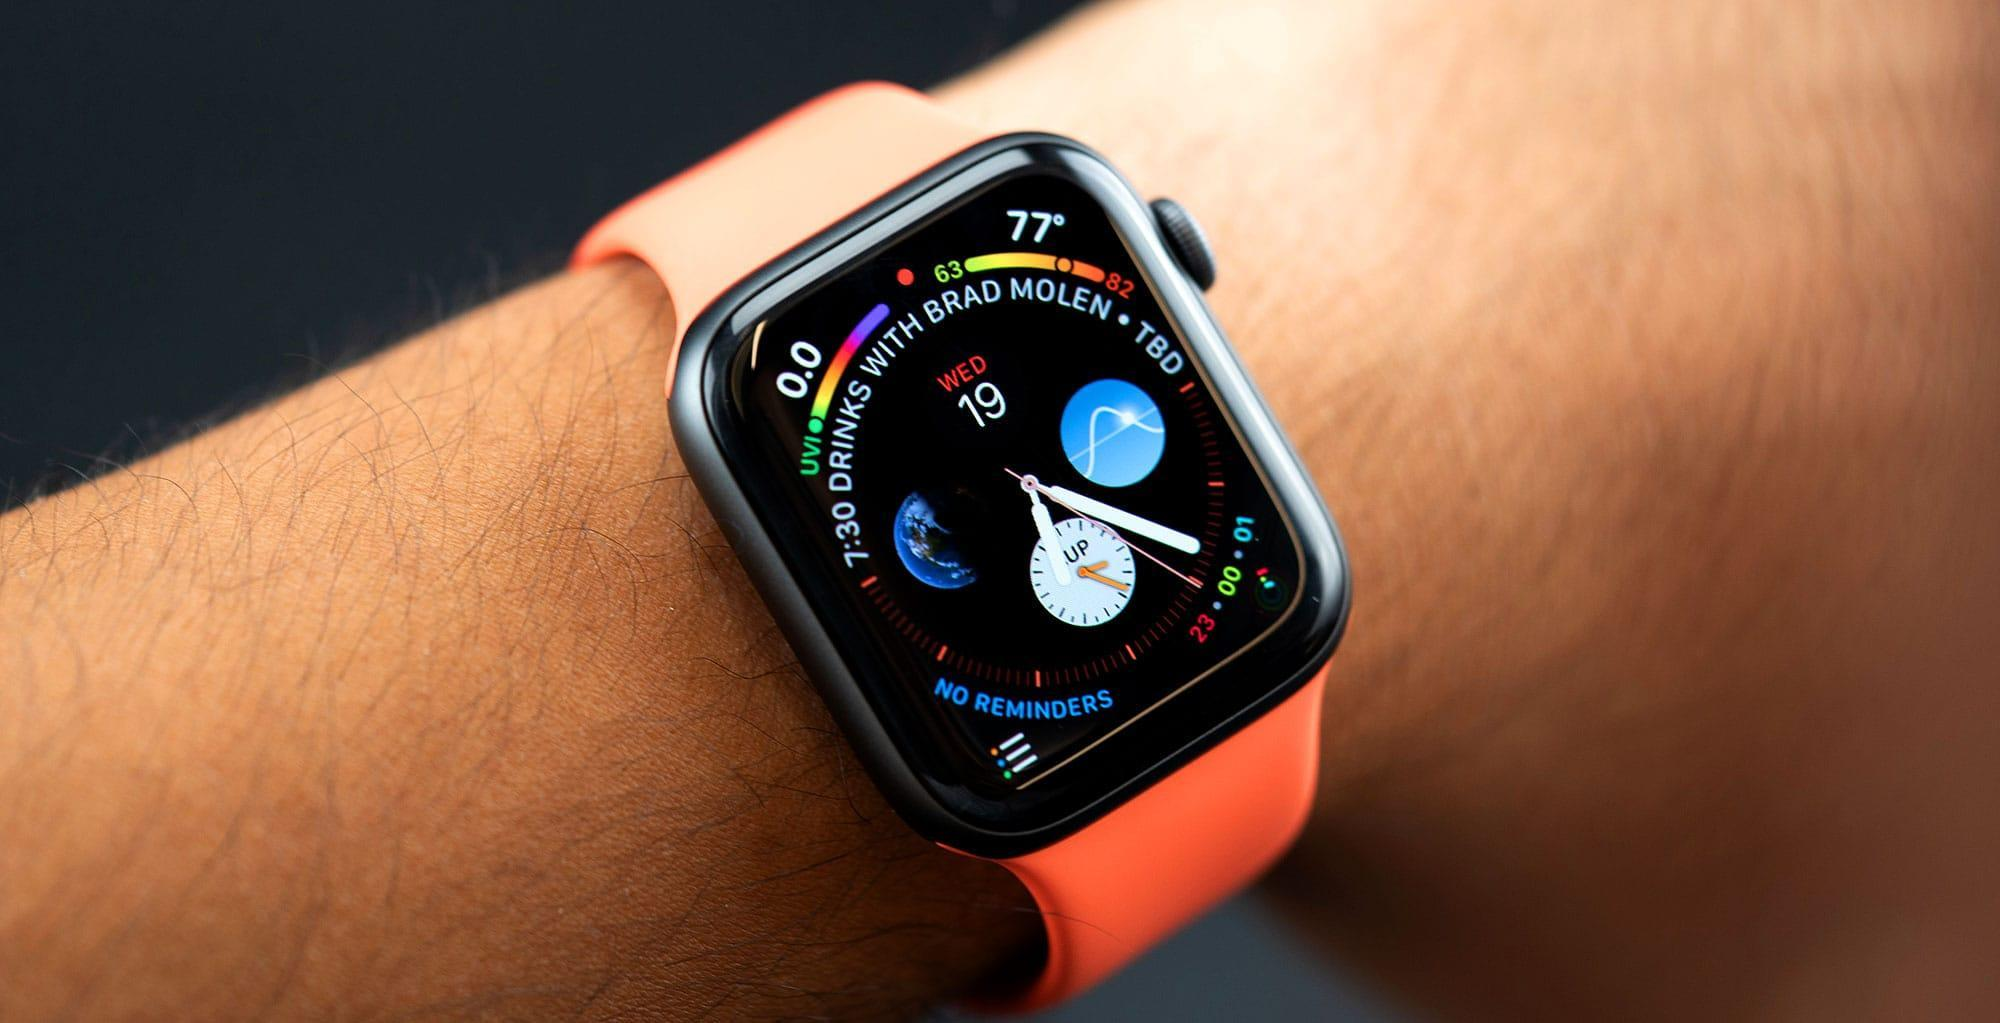 Apple Watch Series 4 review: Small tweaks make a big impact | Engadget